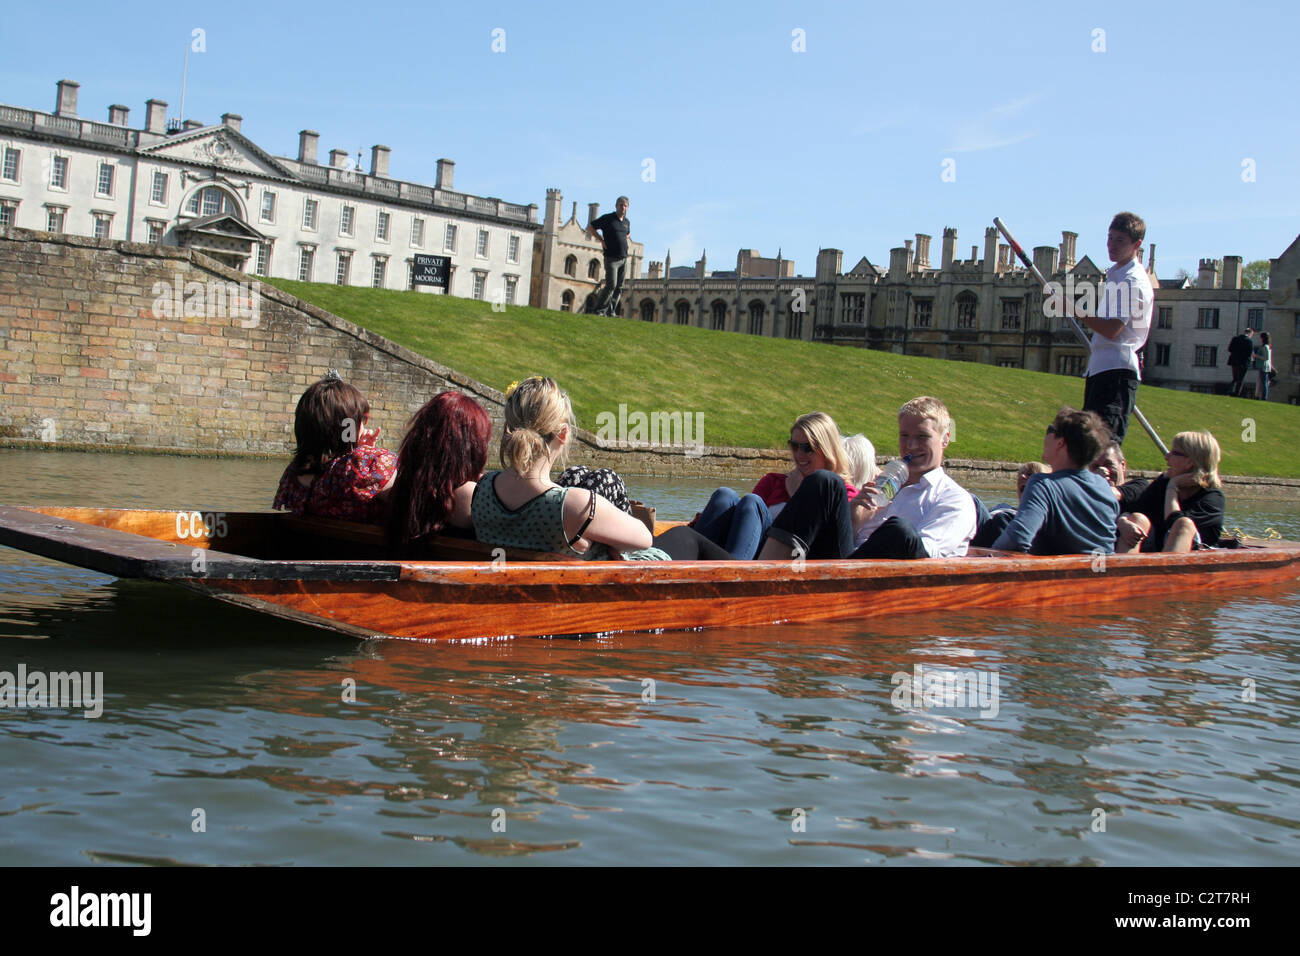 Tourist punters on the River Cam in Cambridge, Cambridgeshire, England, UK - Stock Image